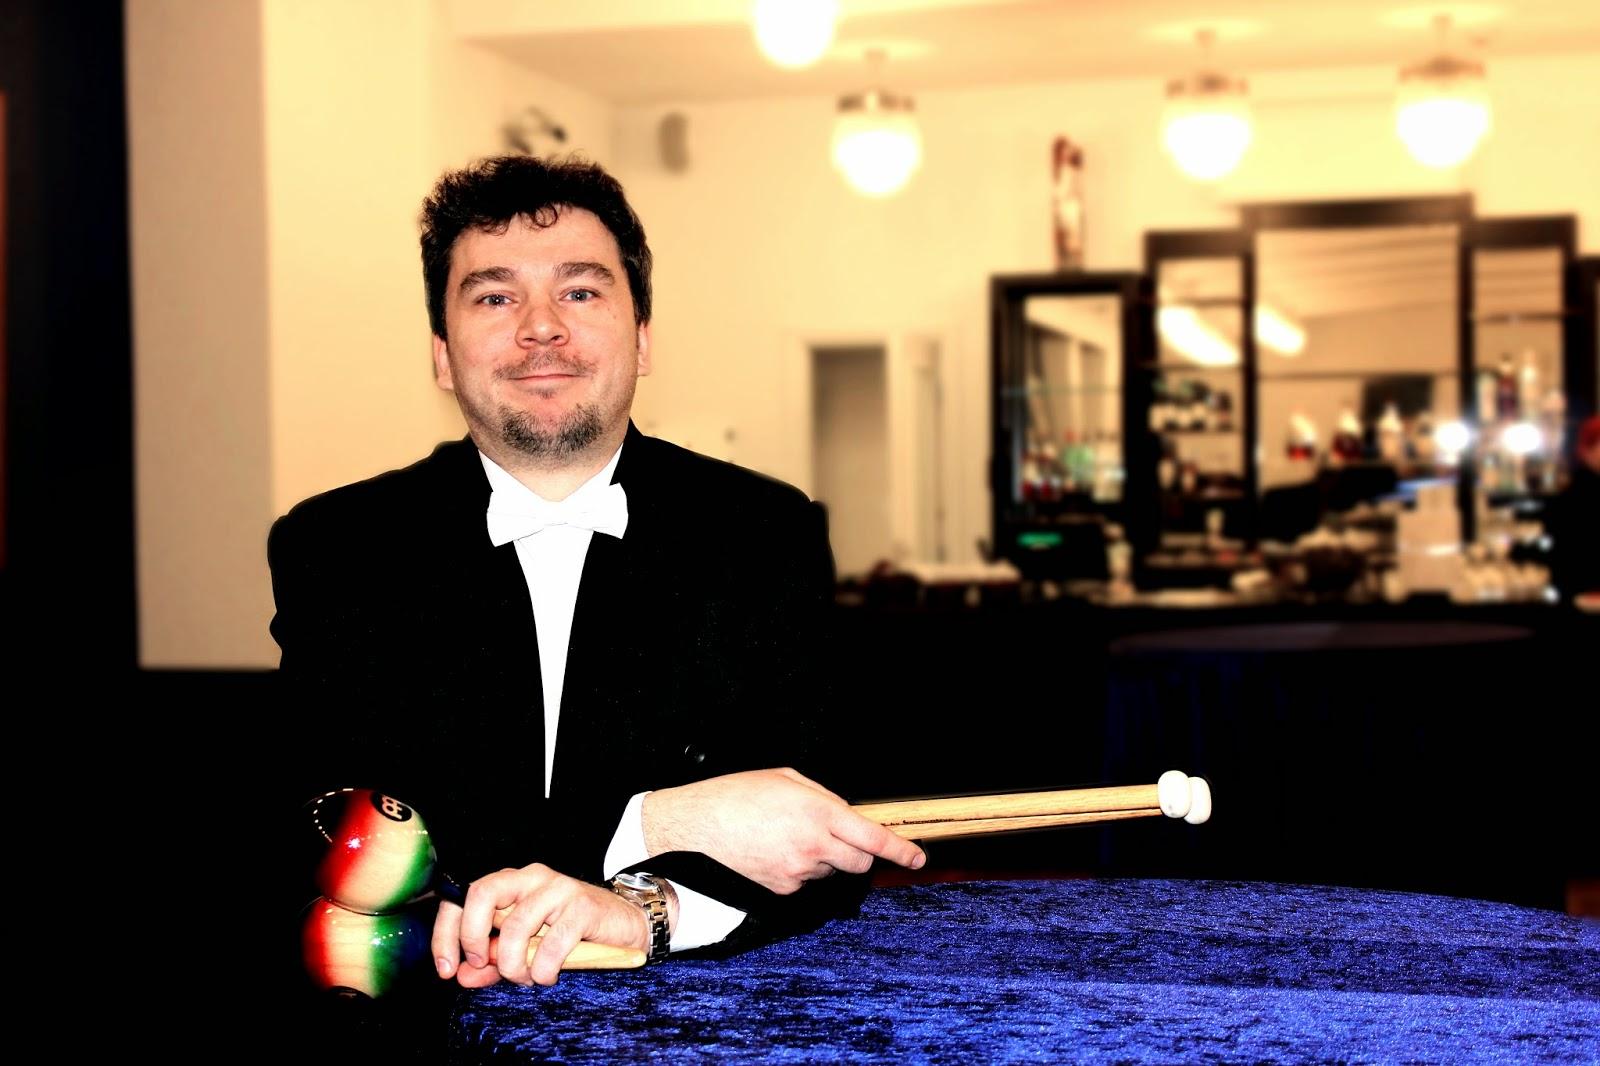 Estonian Academic Brass Quintet: Members